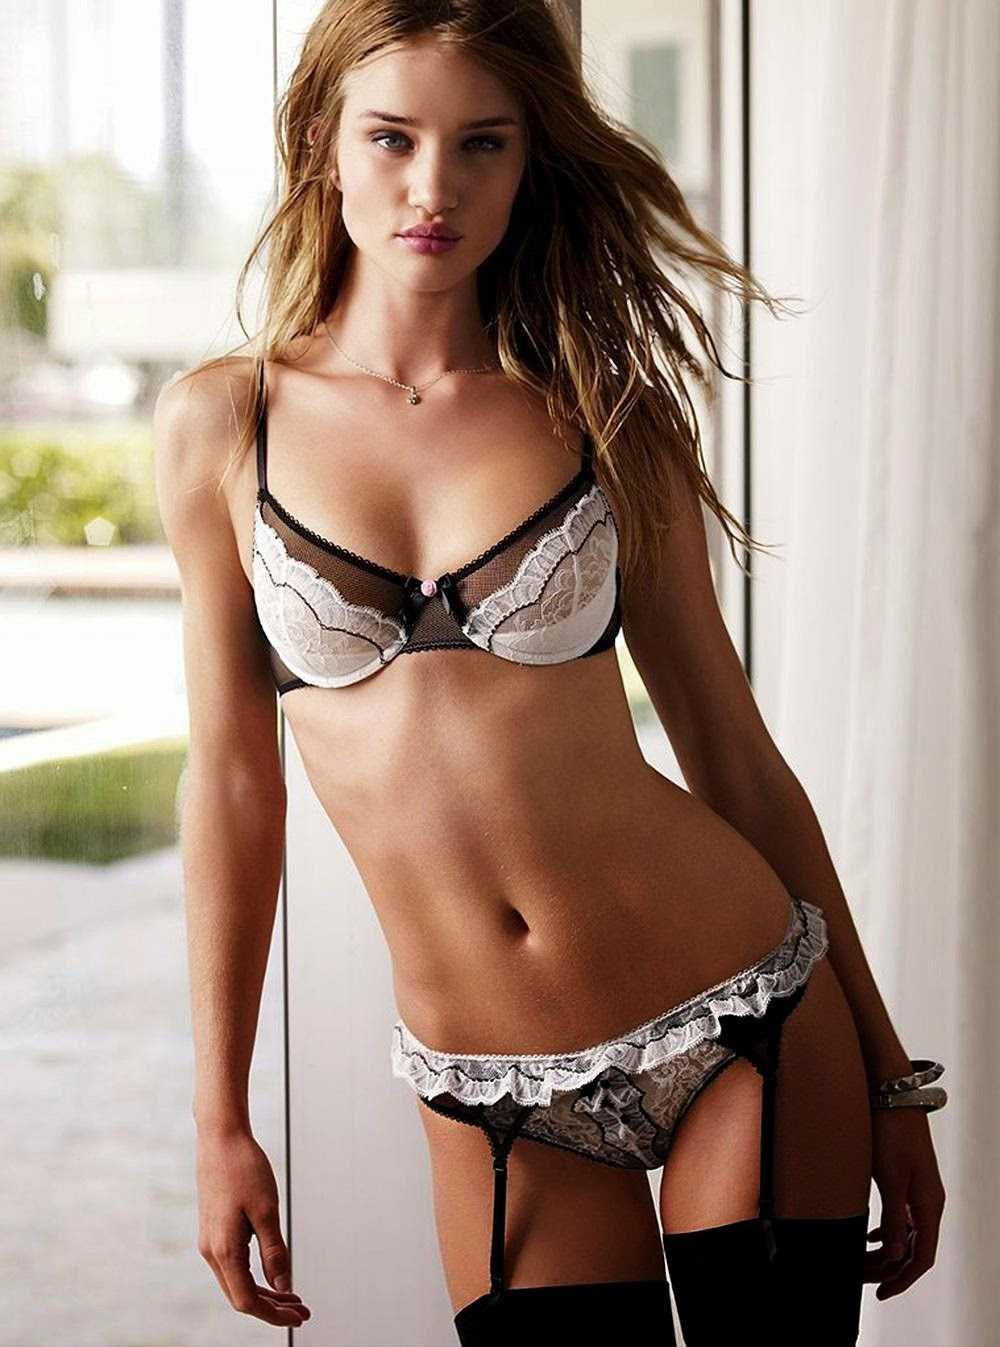 Rosie Huntington-Whiteley bikini pic